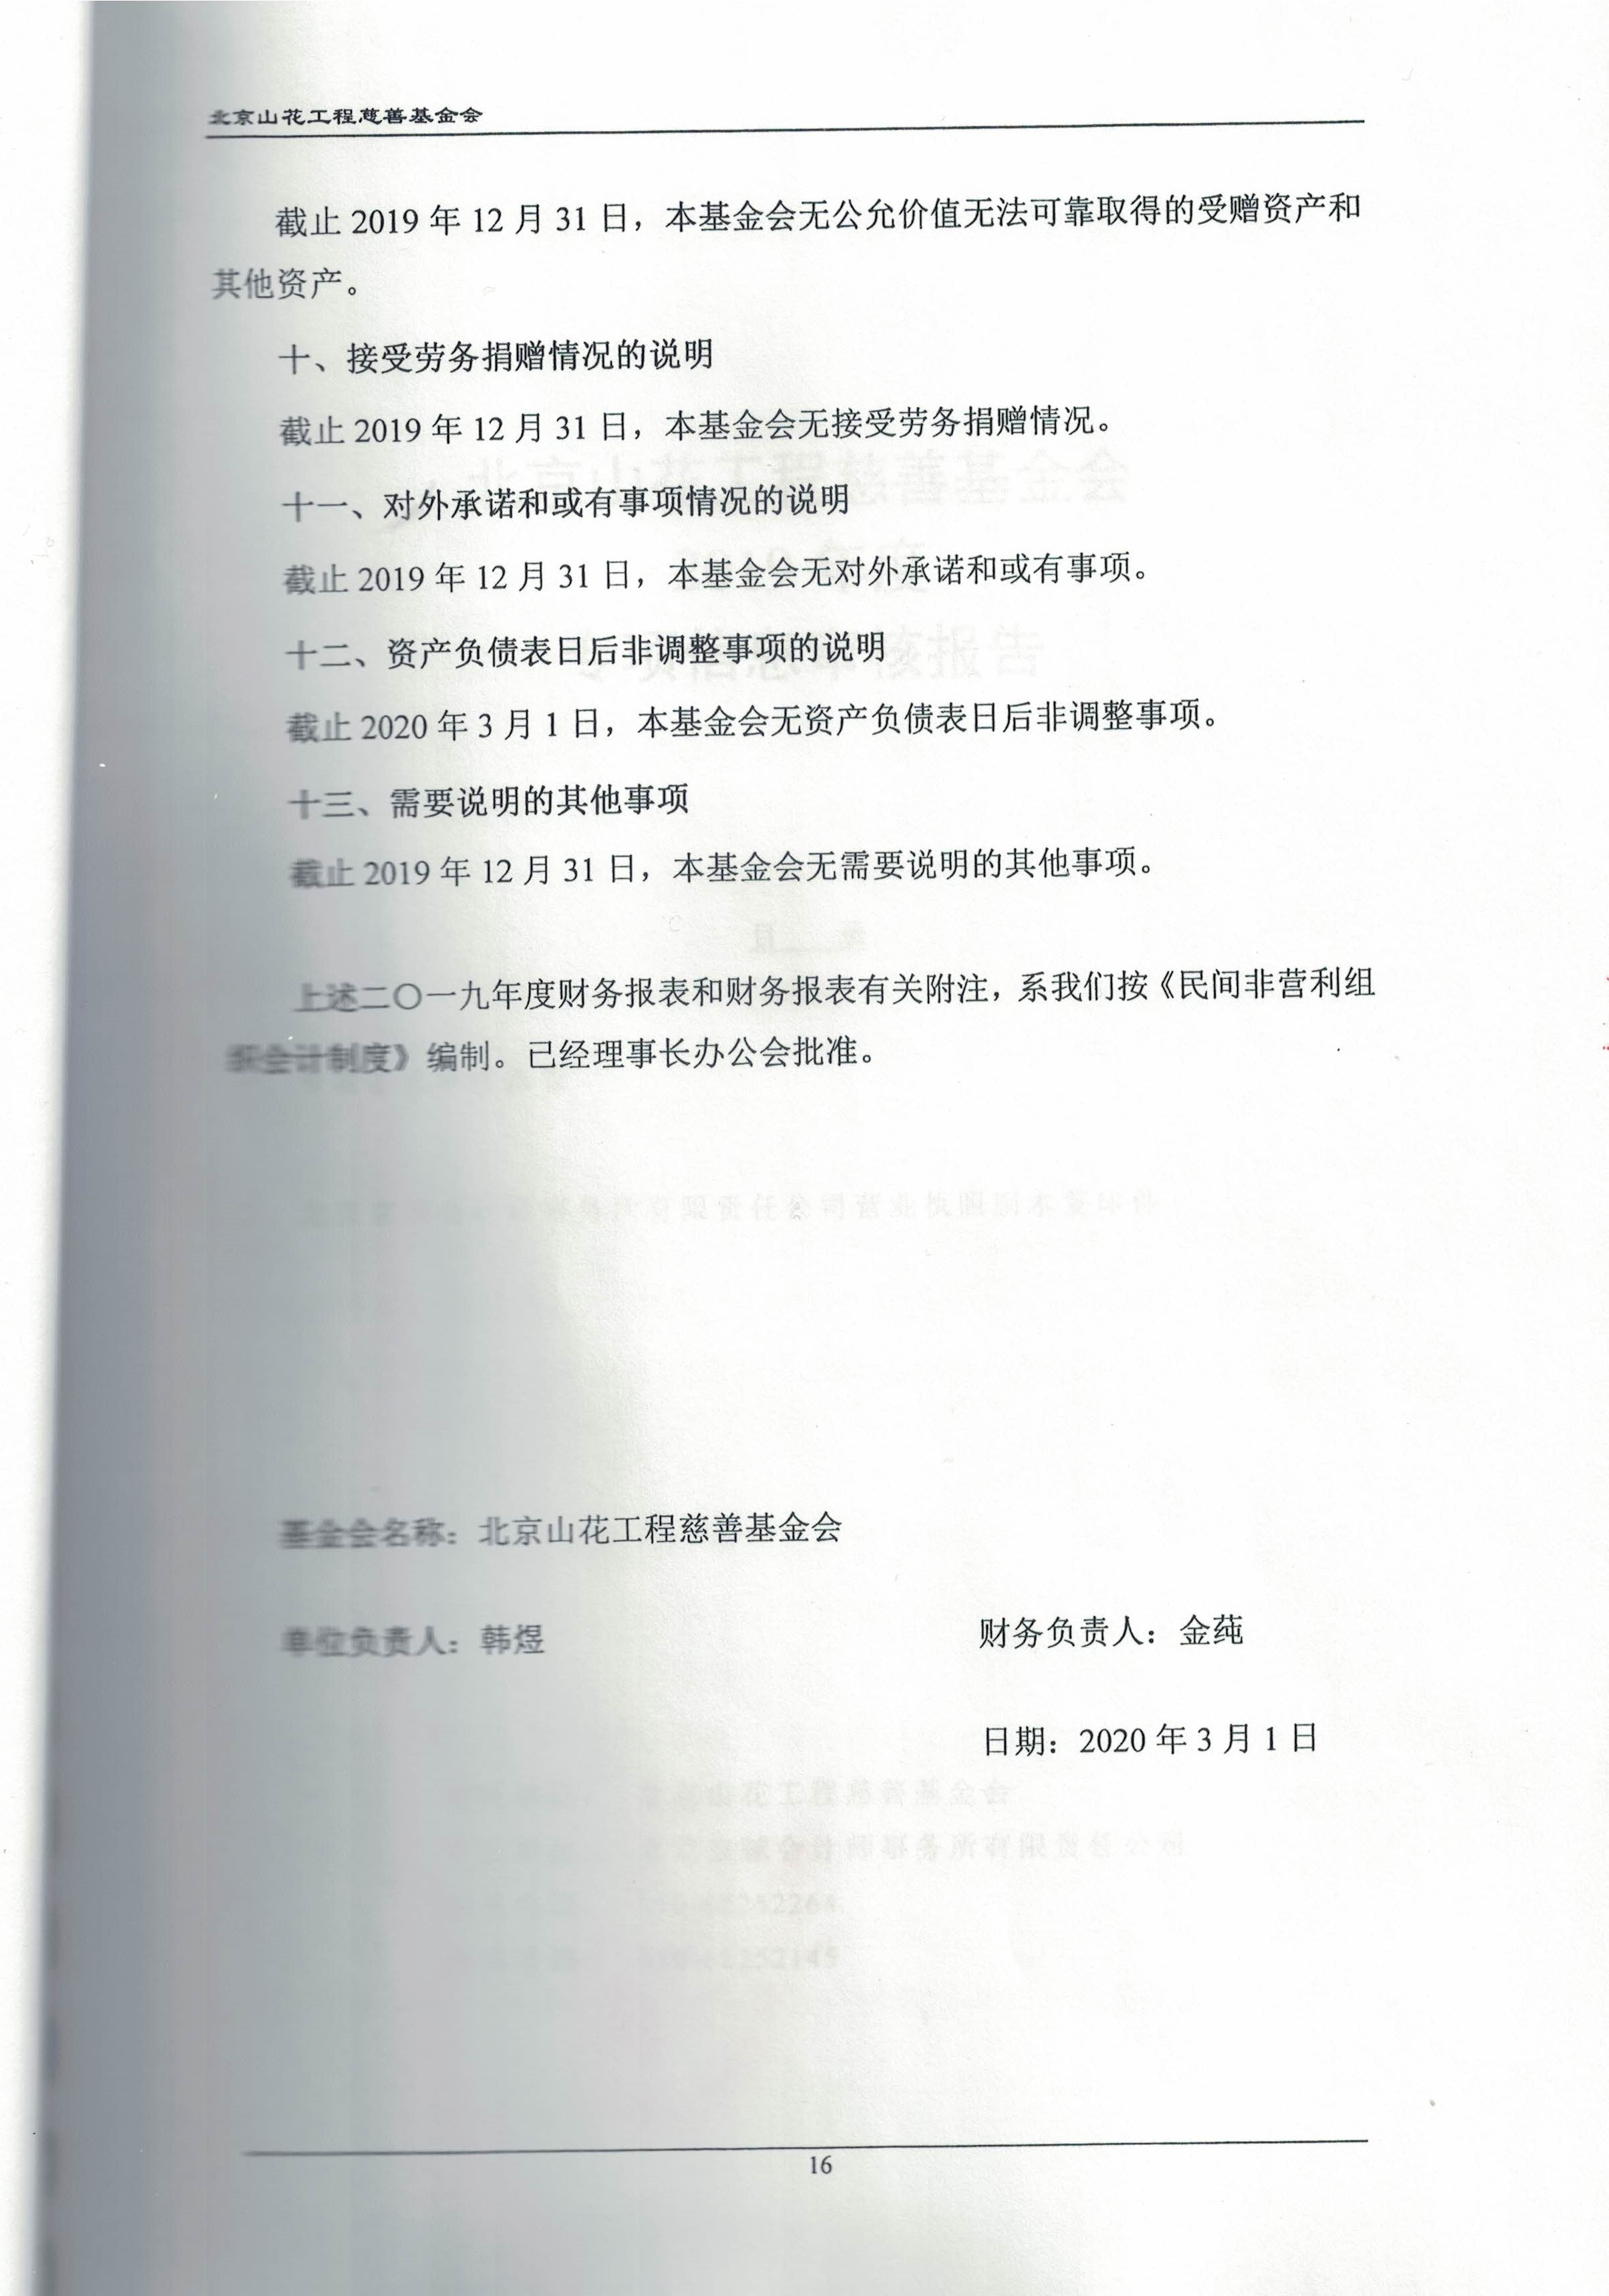 CCF20210114_0001_页面_18